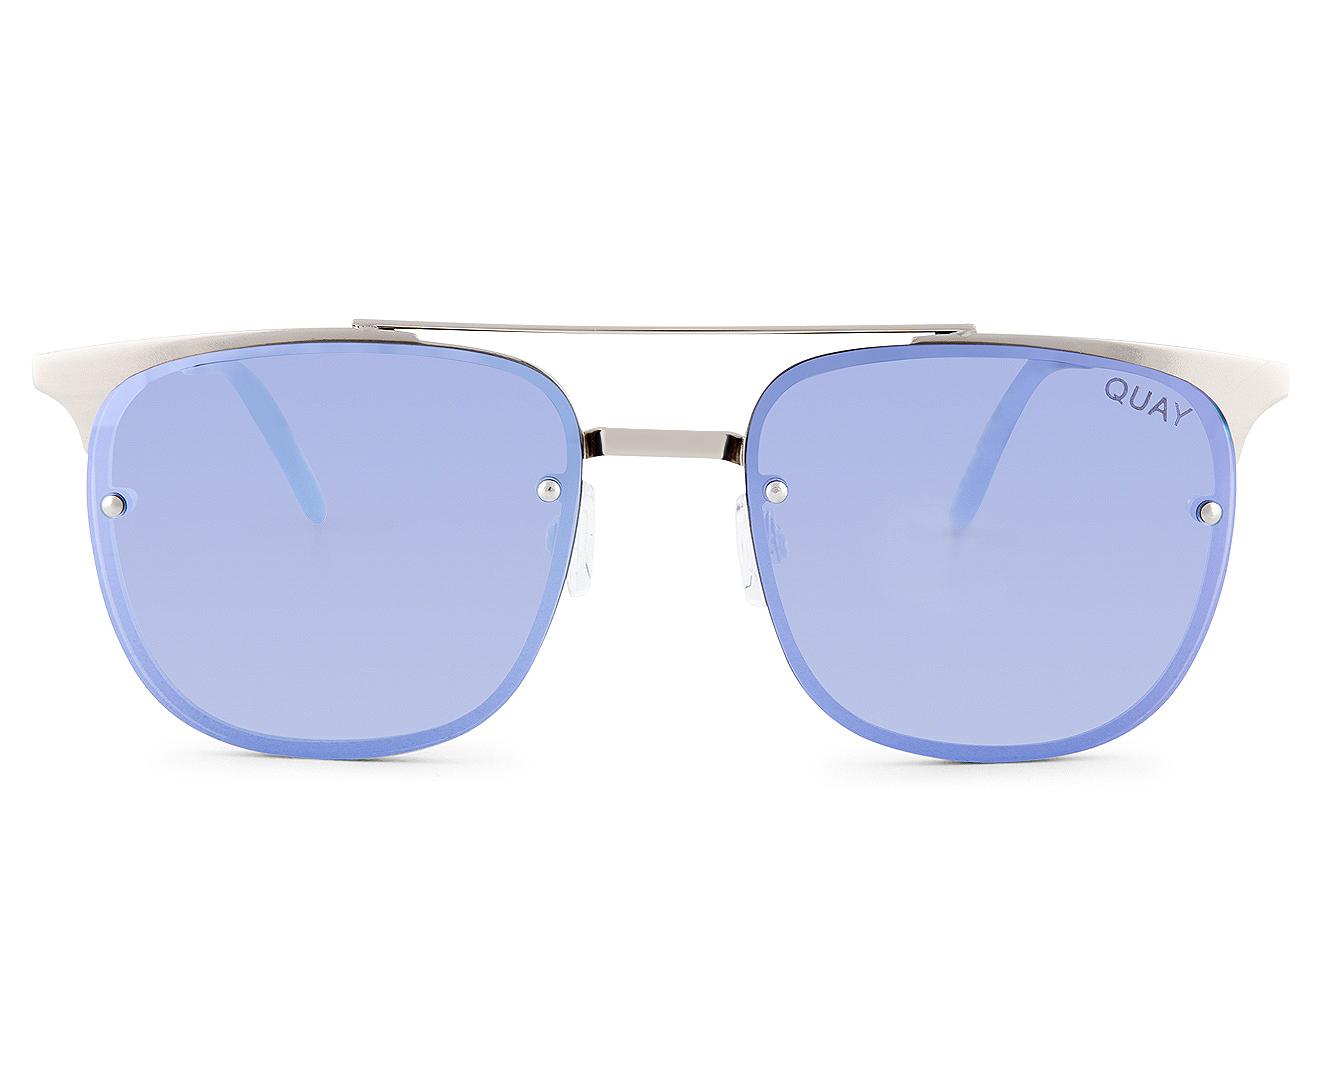 d1803bc543 Quay Australia Women s Rimless Private Eyes Sunglasses - Silver Violet